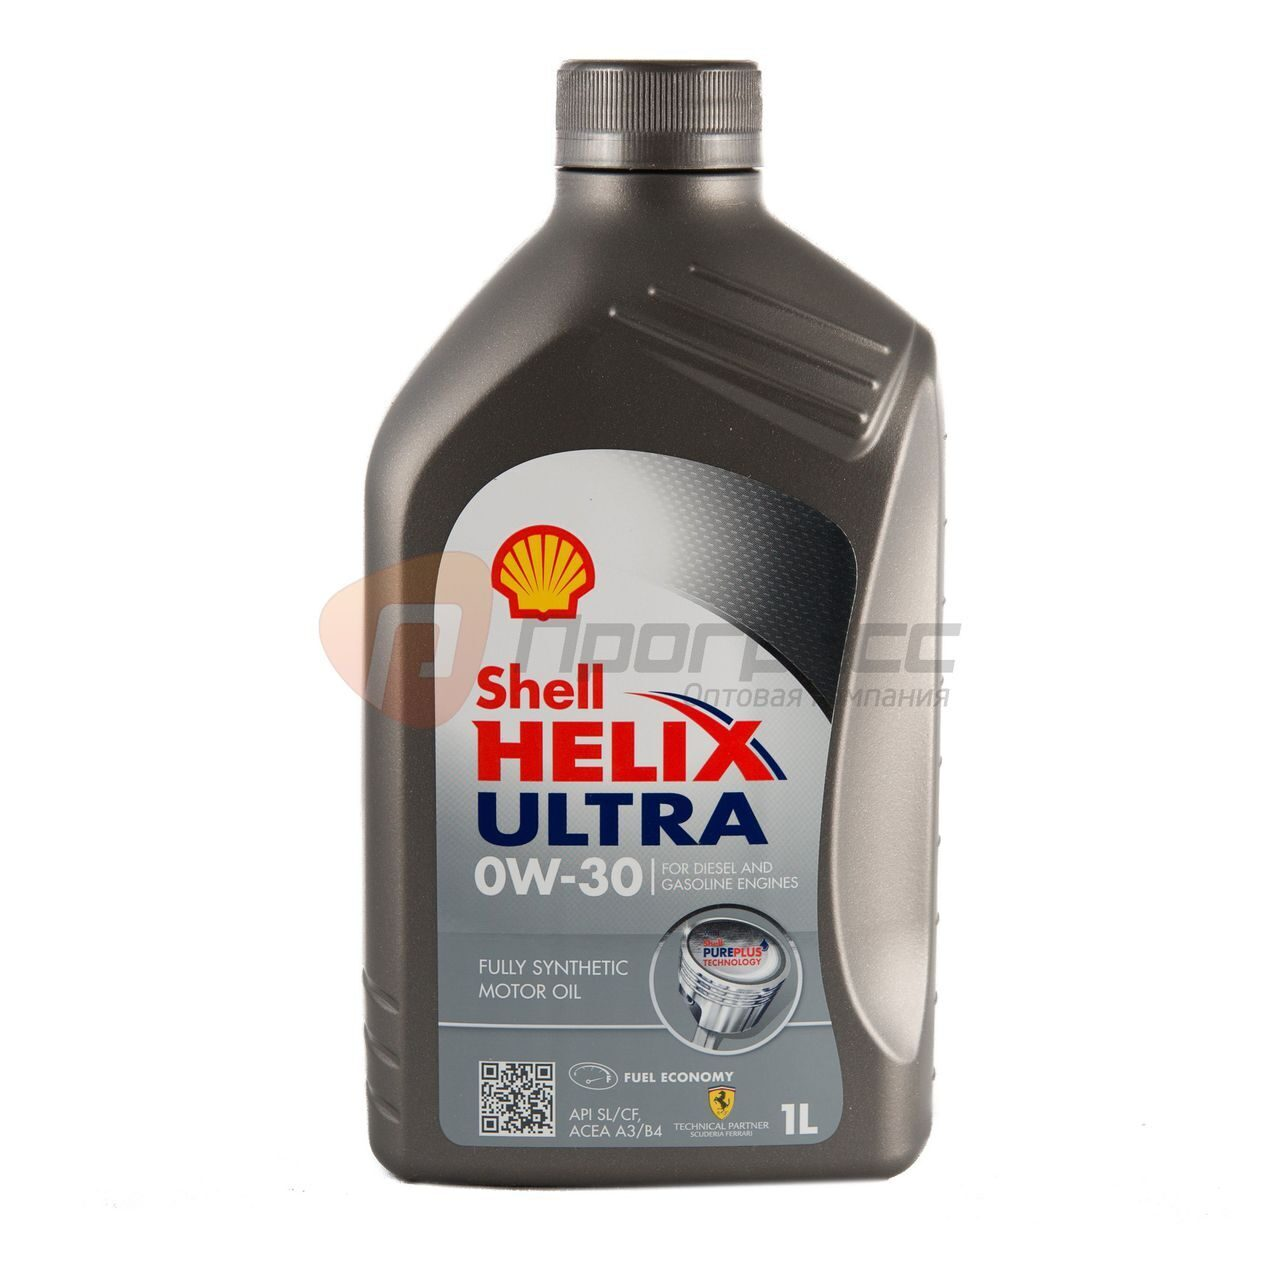 Shell Helix Ultra 502 505